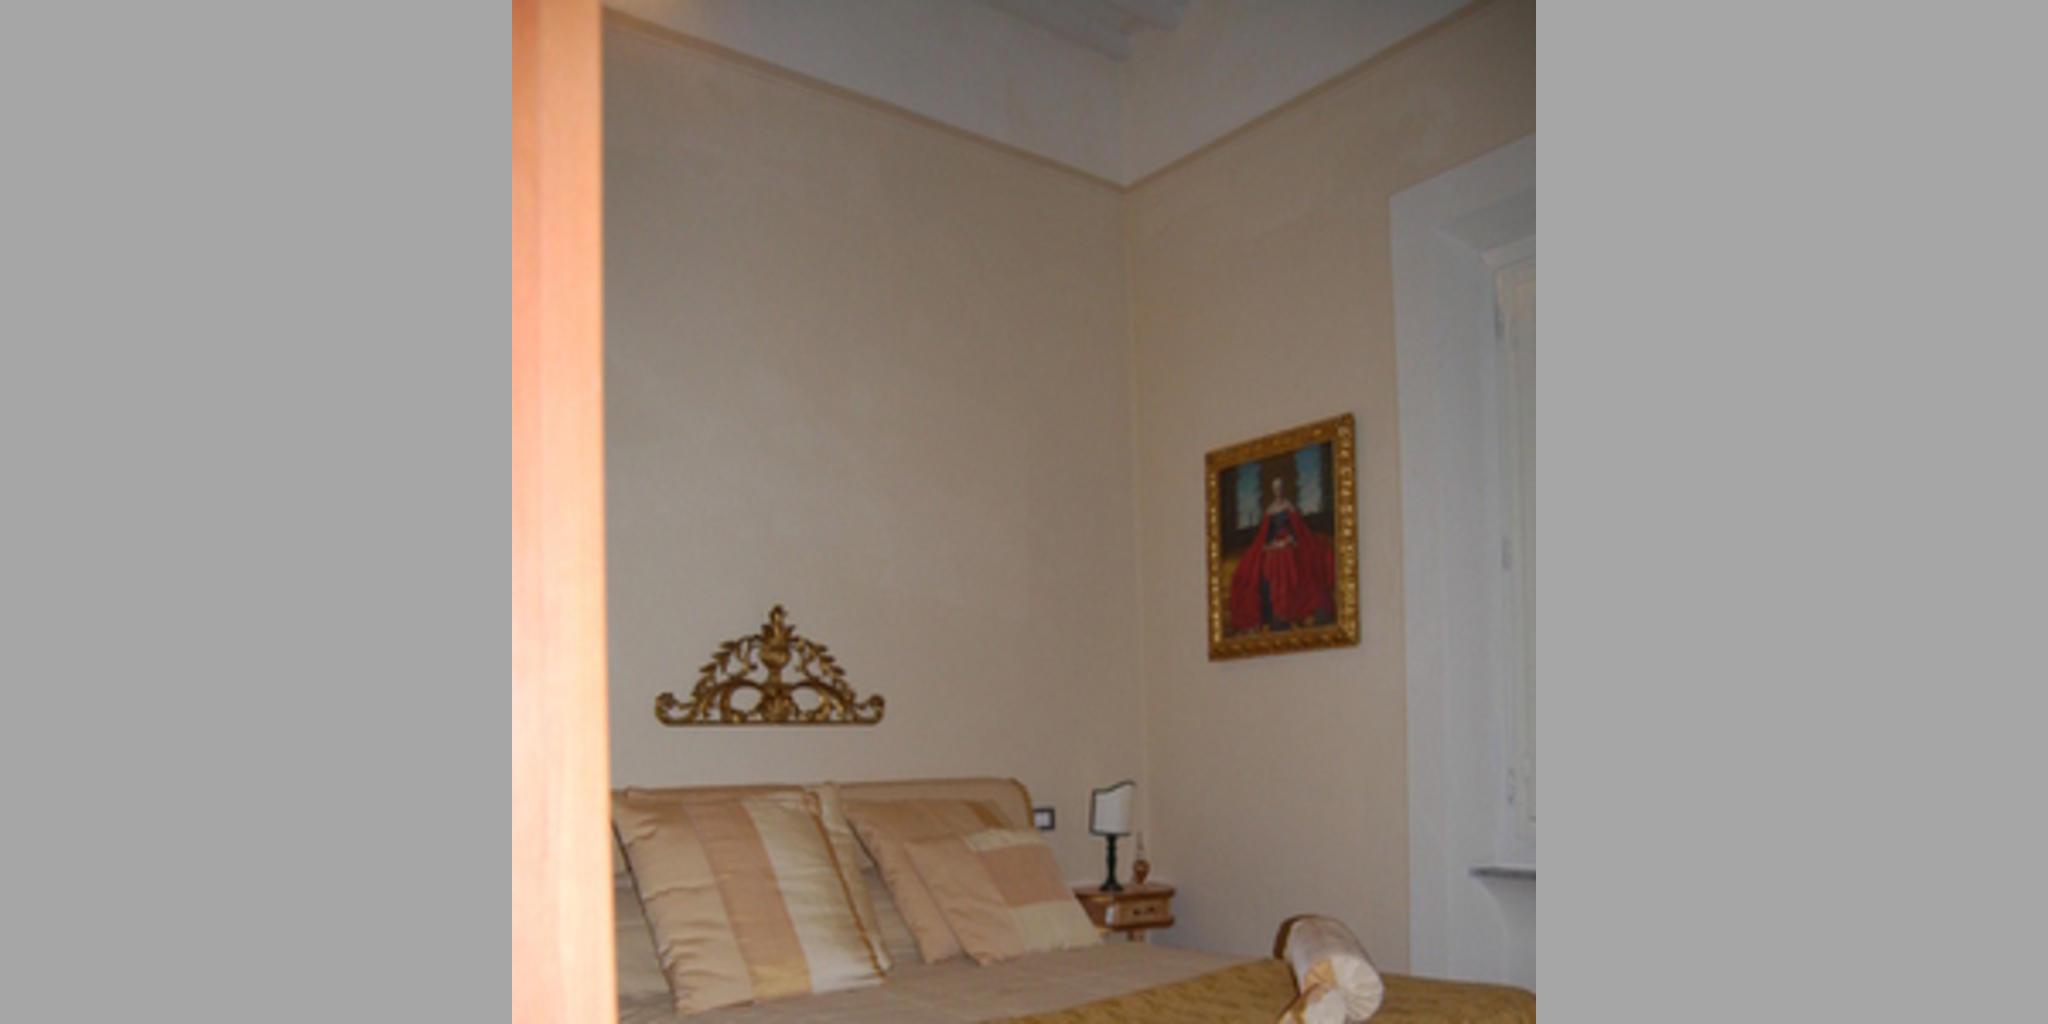 Bed & Breakfast San Giuliano Terme - San Giuliano Terme_A